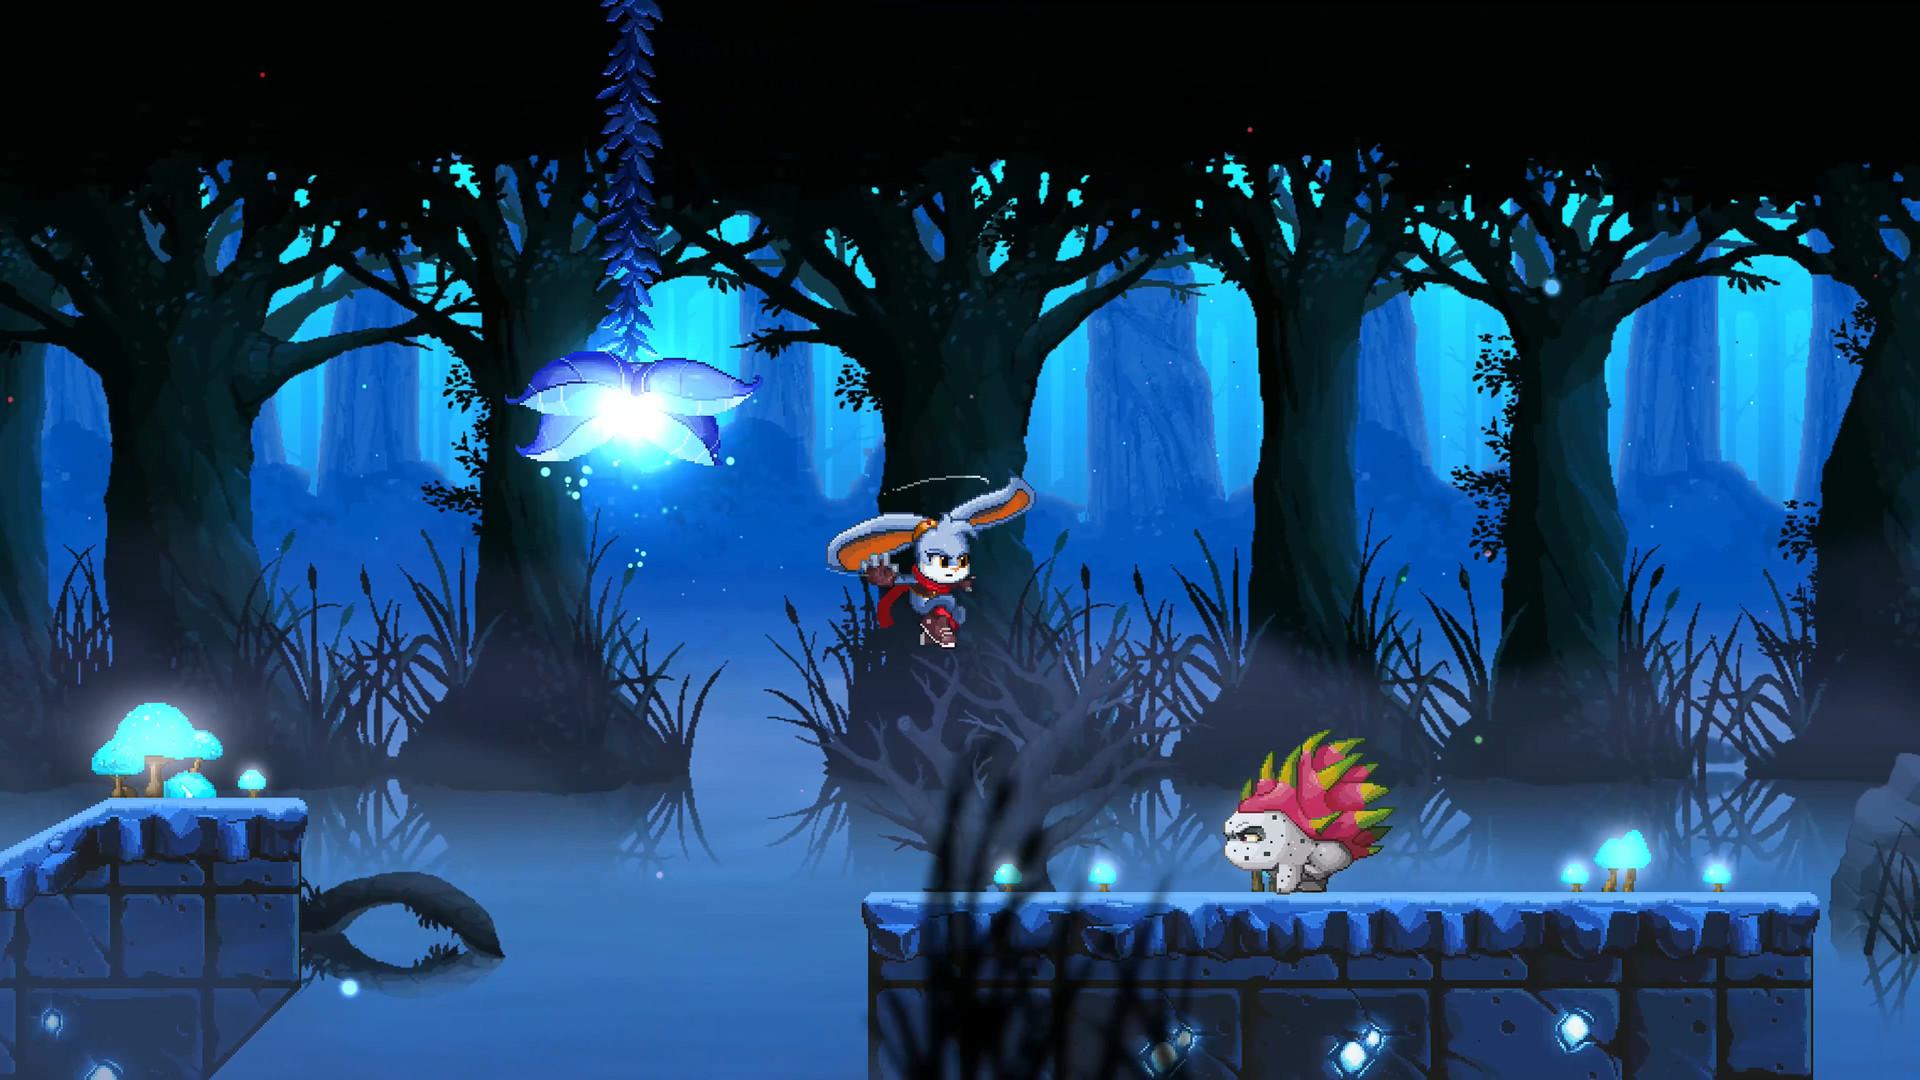 kaze-and-the-wild-masks-pc-screenshot-4